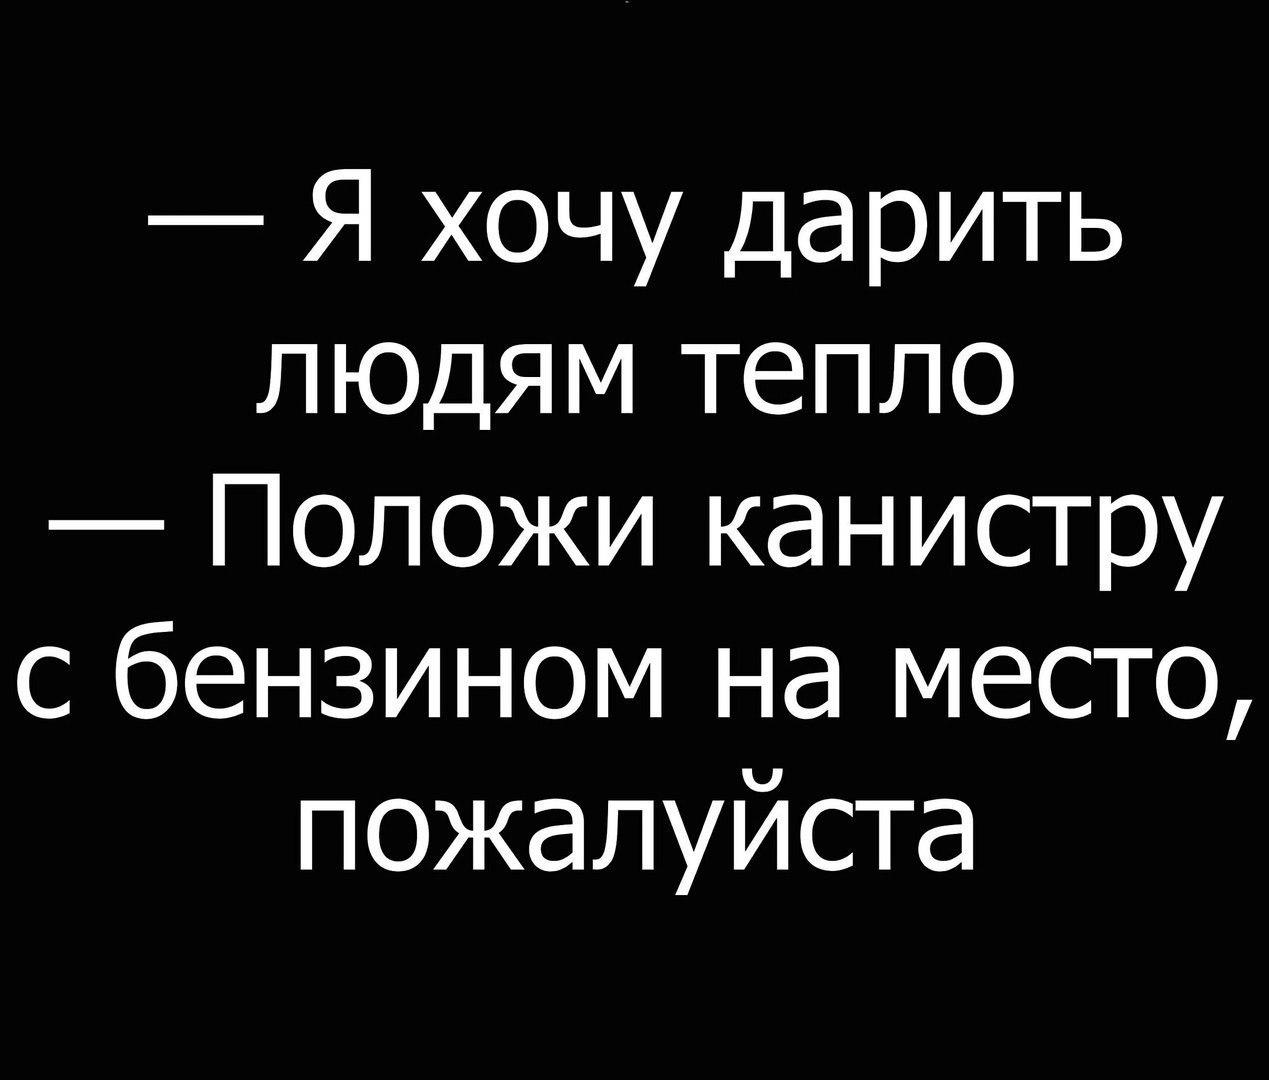 https://pp.userapi.com/c837728/v837728728/93a35/8aGvjrdhxj4.jpg